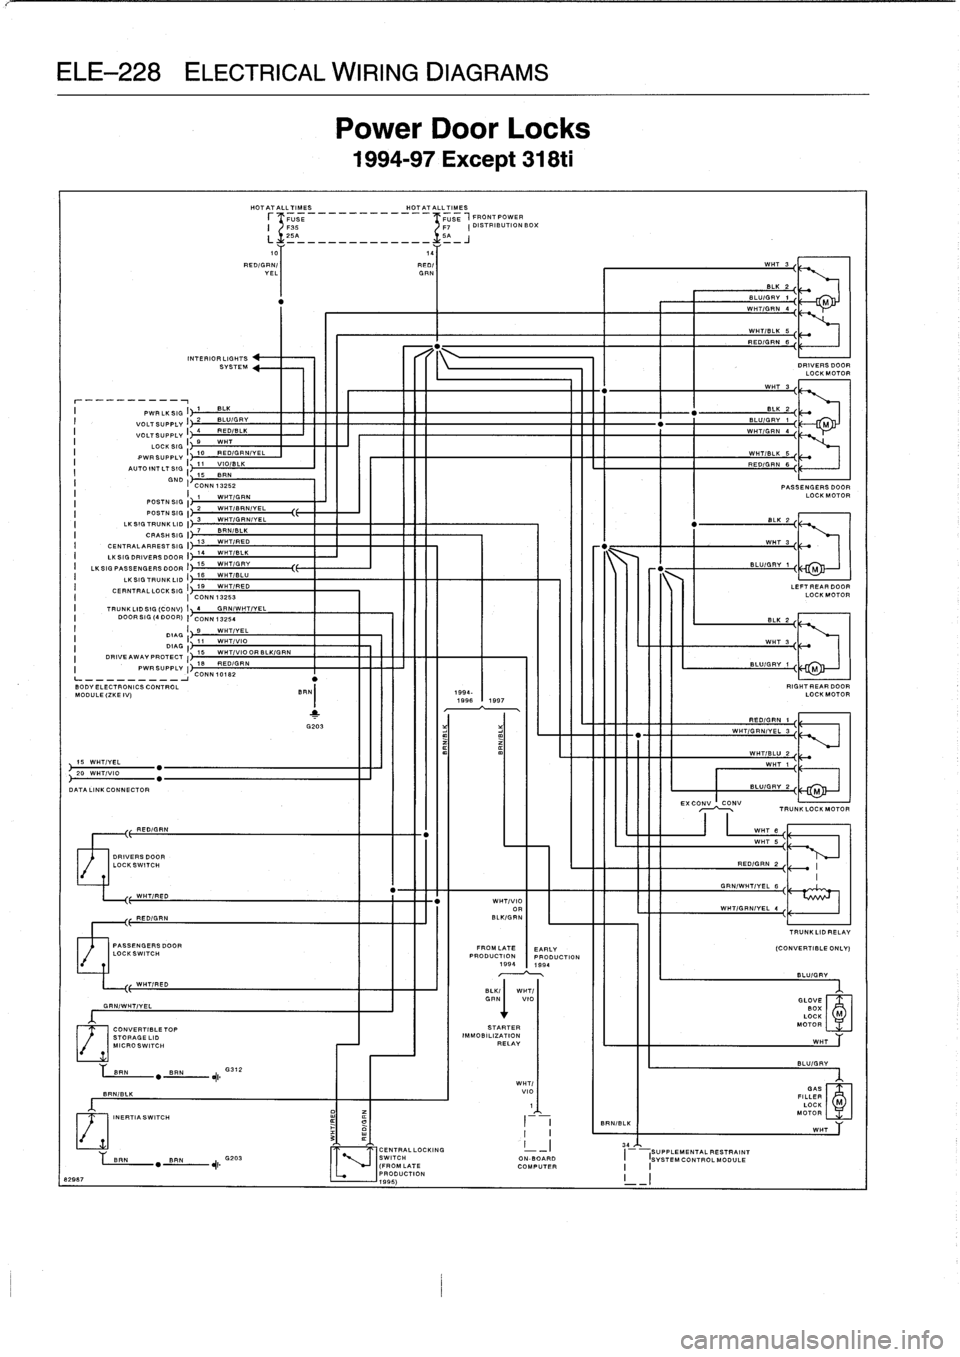 Ehc Wiring Diagram 1999 Bmw 540i 528i Diagrams Engine Parts Libraryehc Auto Electrical